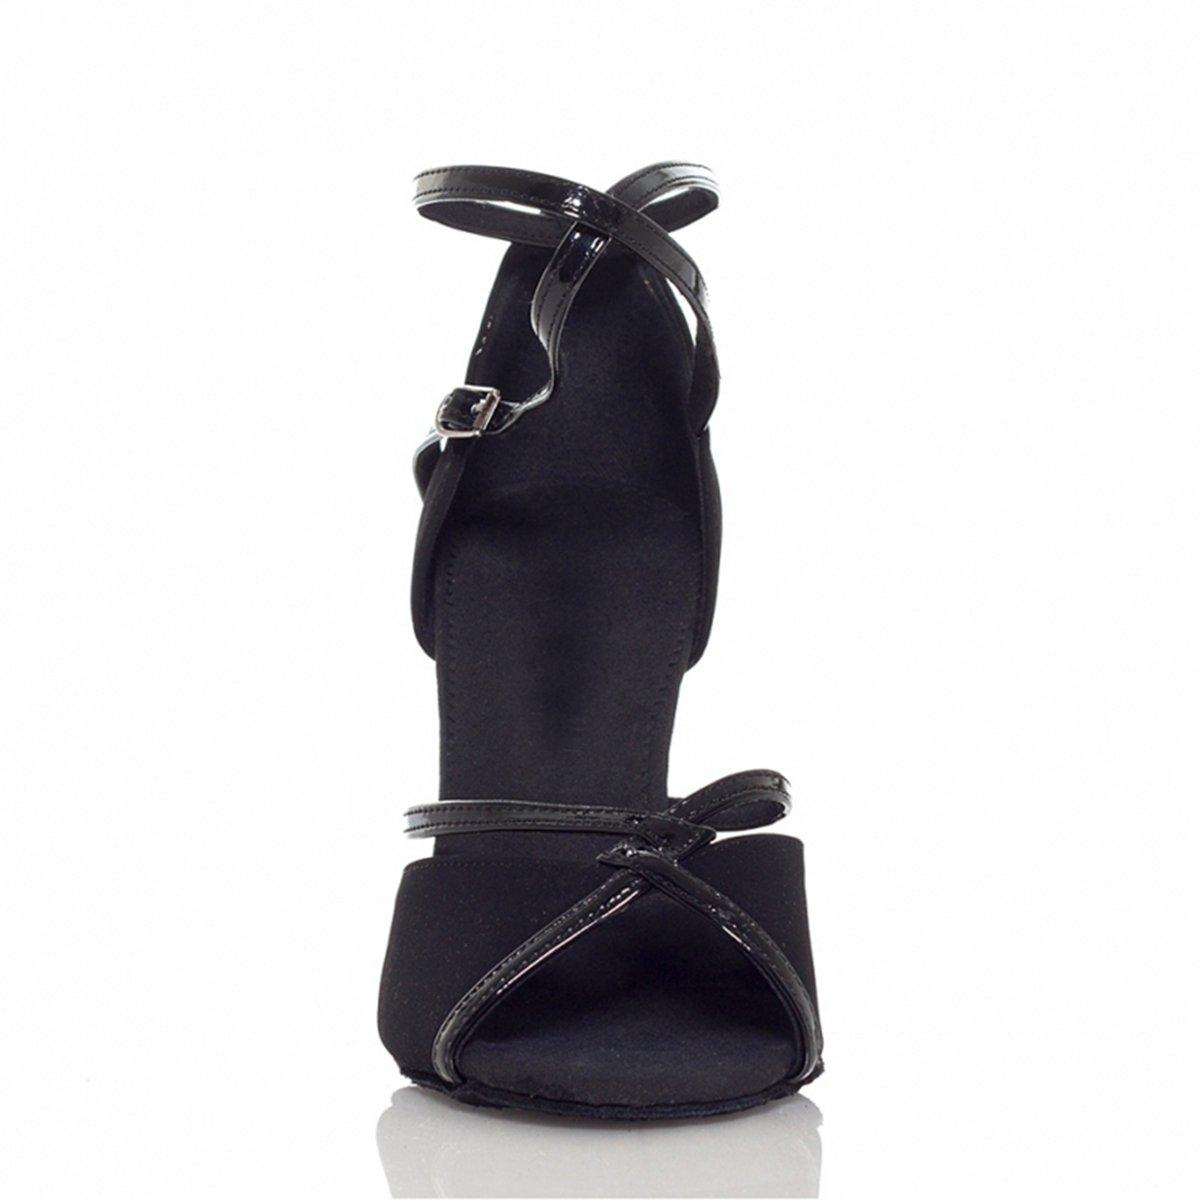 MINITOO L194 Womens High Heel Suede Leather Latin Salsa Ballroom Dance Sandals